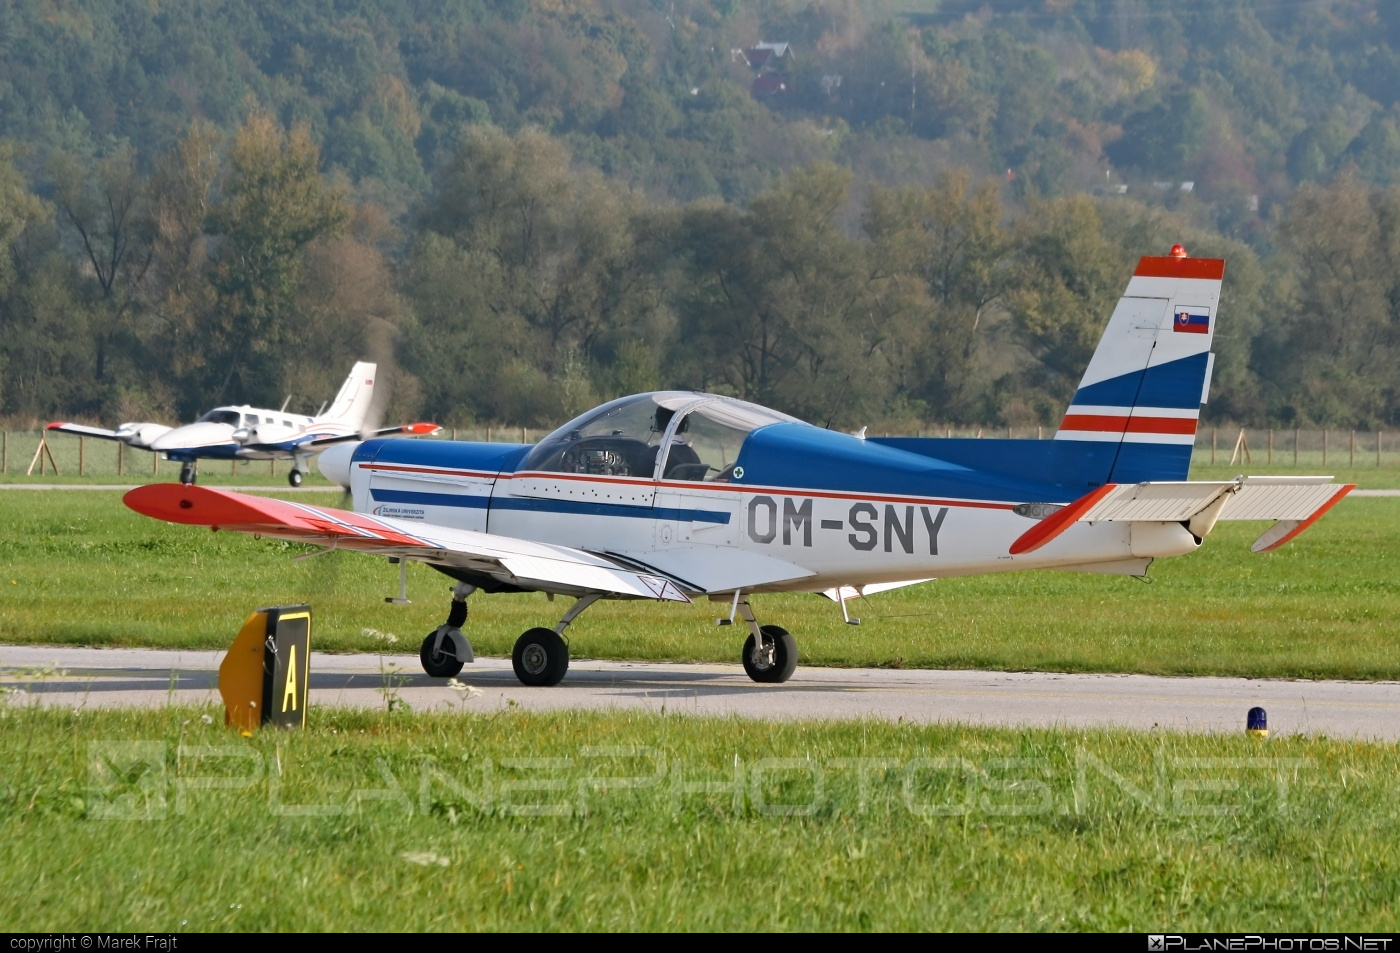 Zlin Z-142 - OM-SNY operated by University of Žilina #z142 #zlin #zlin142